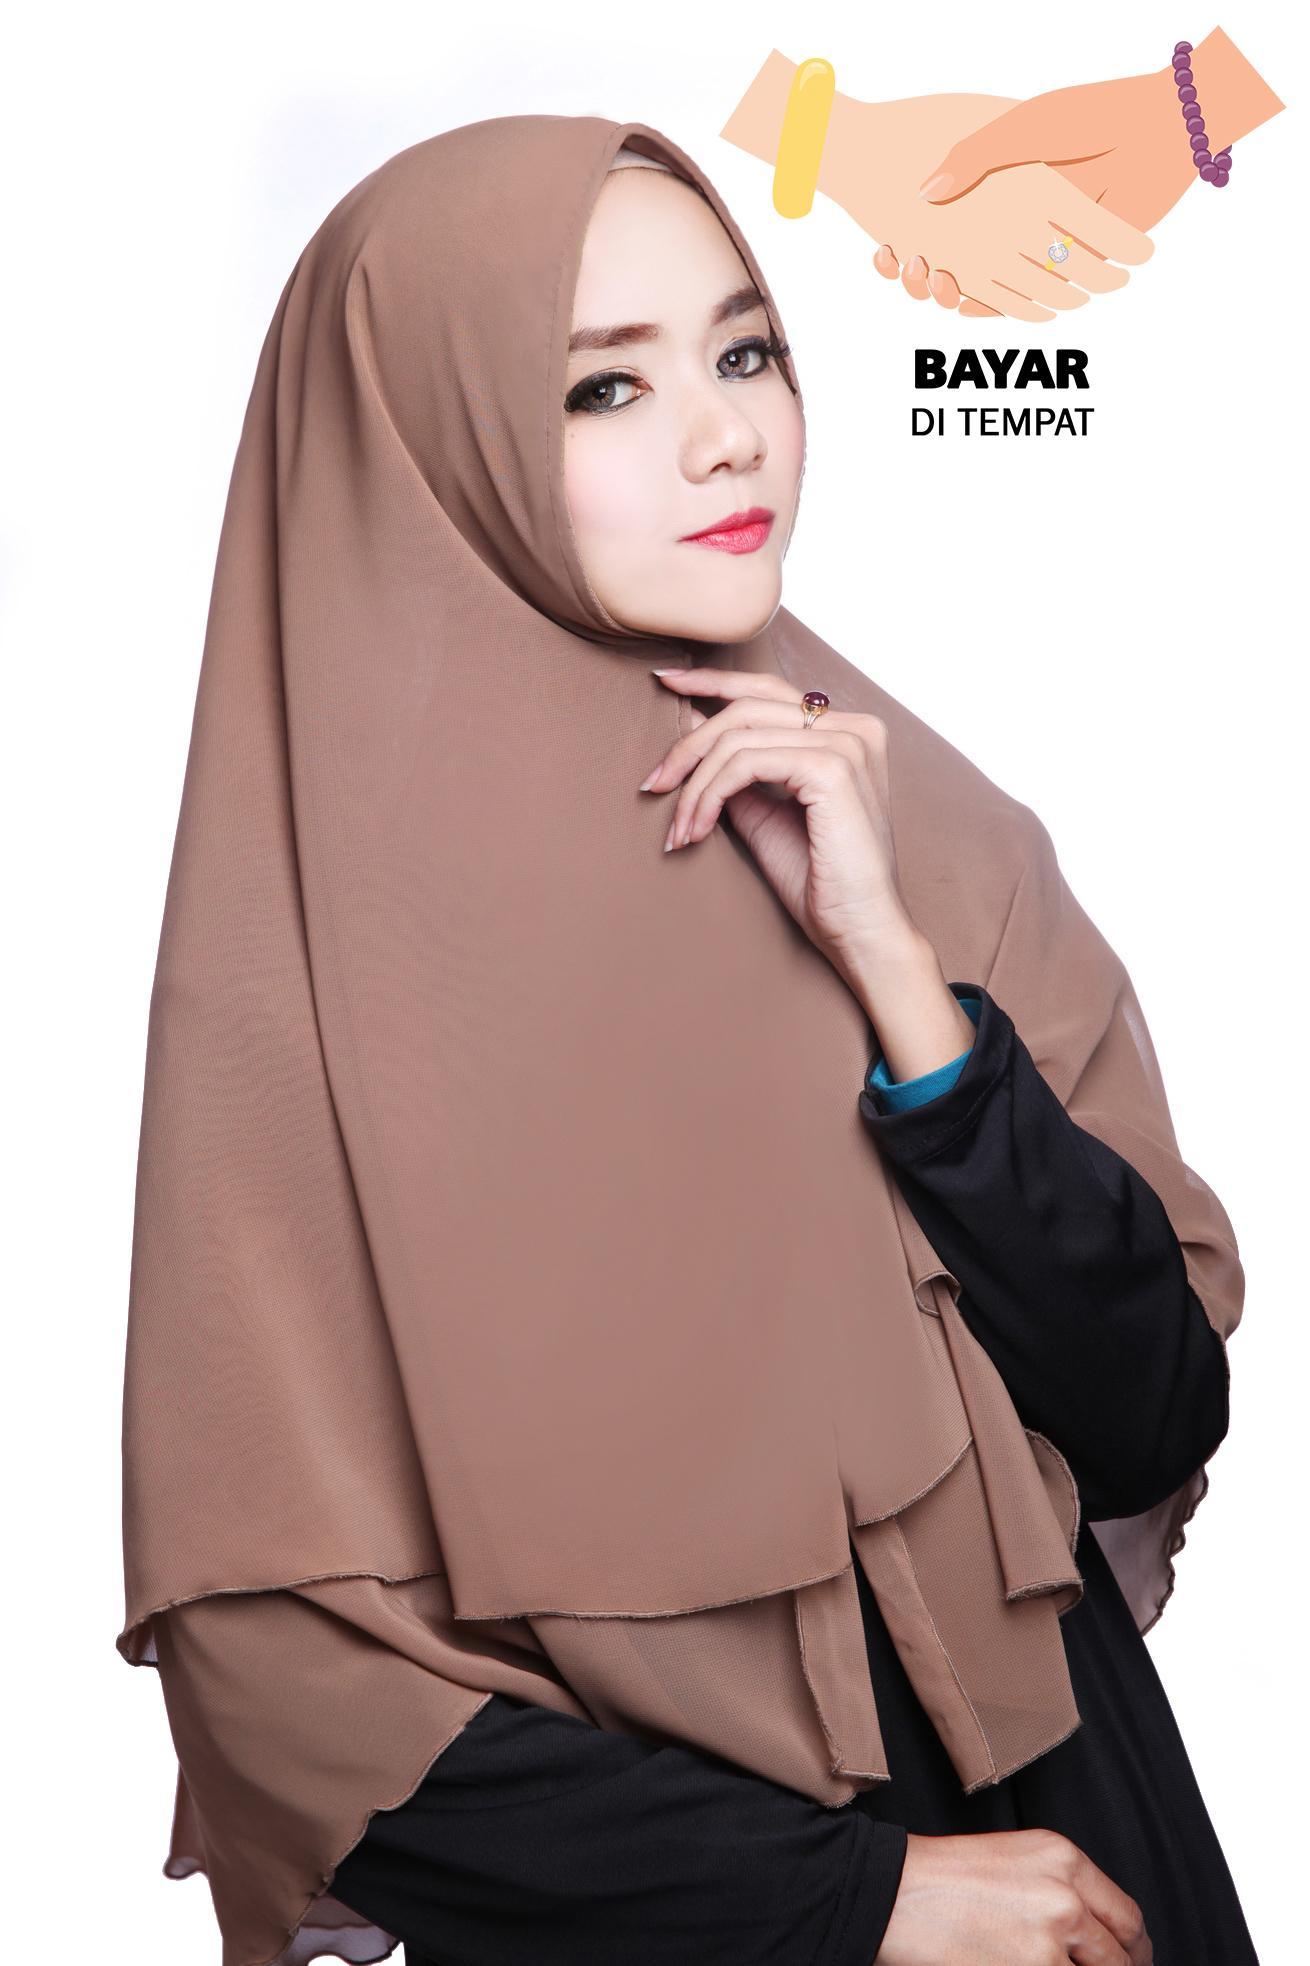 Cek Harga Baru Hijab Panjang Syari Model French Jilbab Instan Jumbo Rempel Kerudung Khimar Zalwa Milochoco